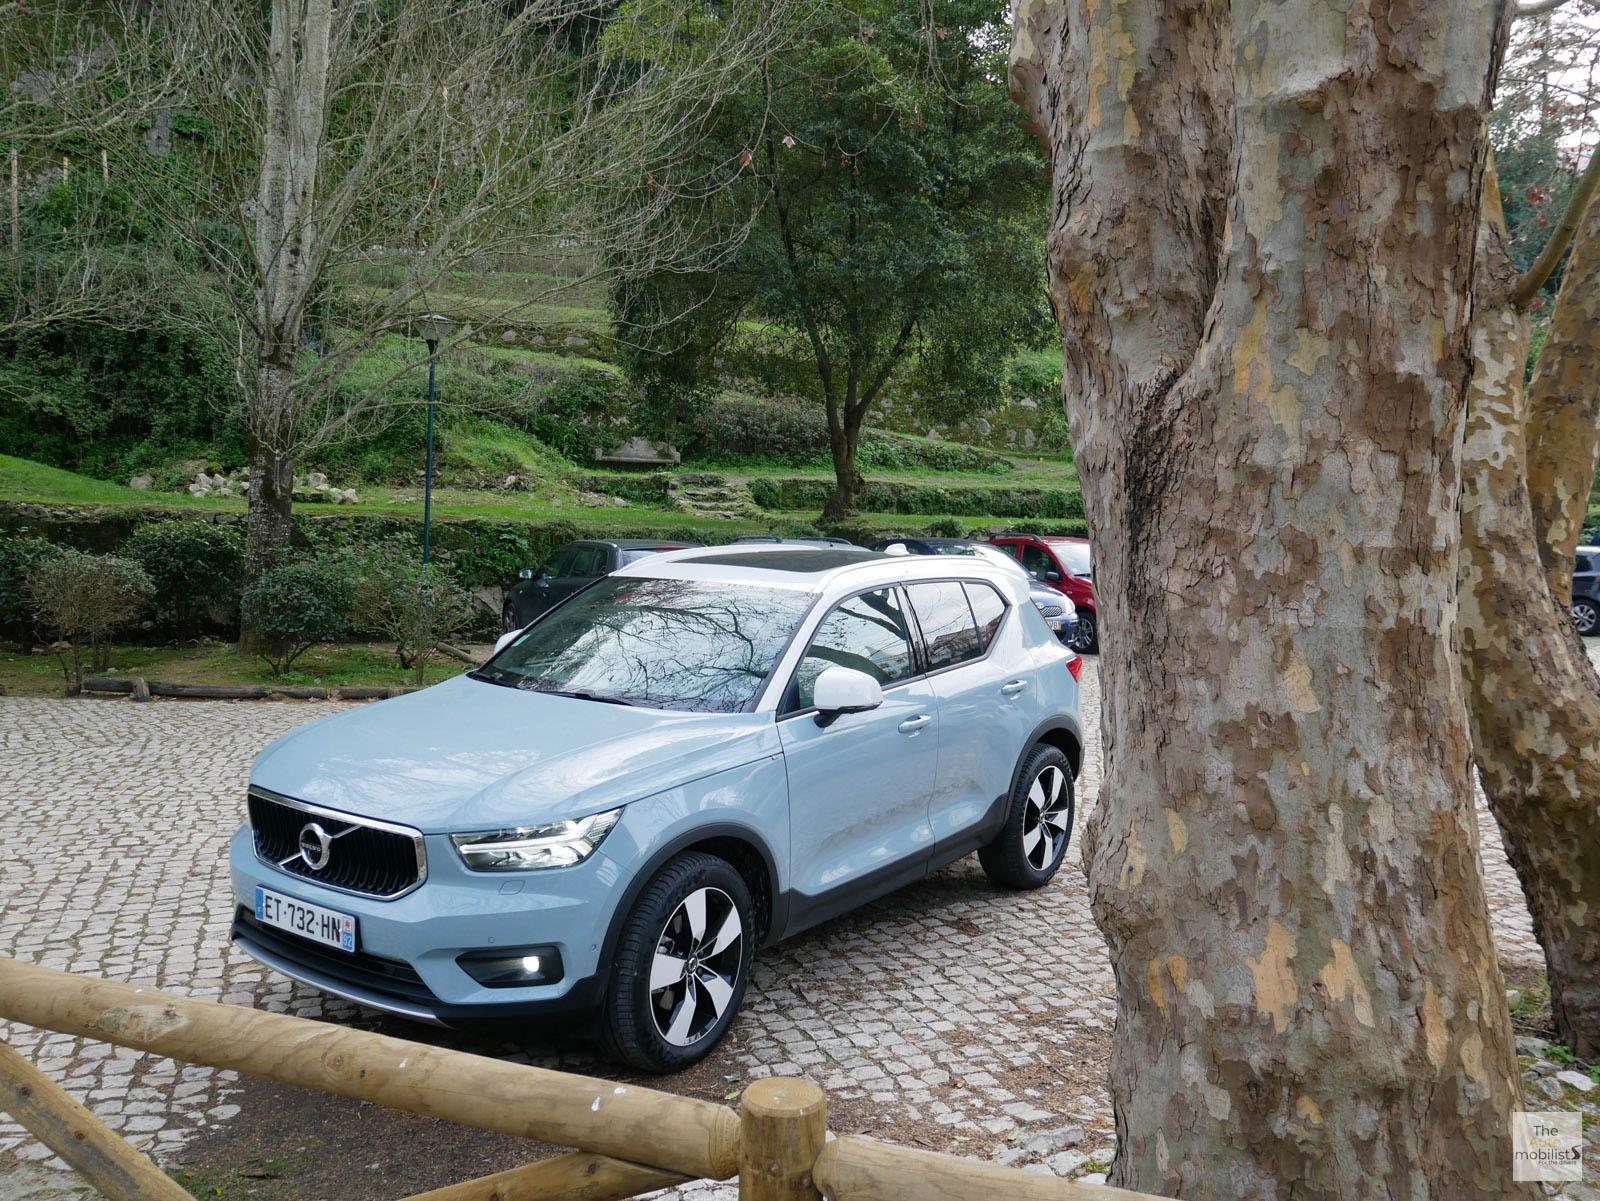 Essai Volvo Xc40 >> Essai Volvo Xc40 D4 Bva Awd Le Premium Scandinave Sur Le Terrain